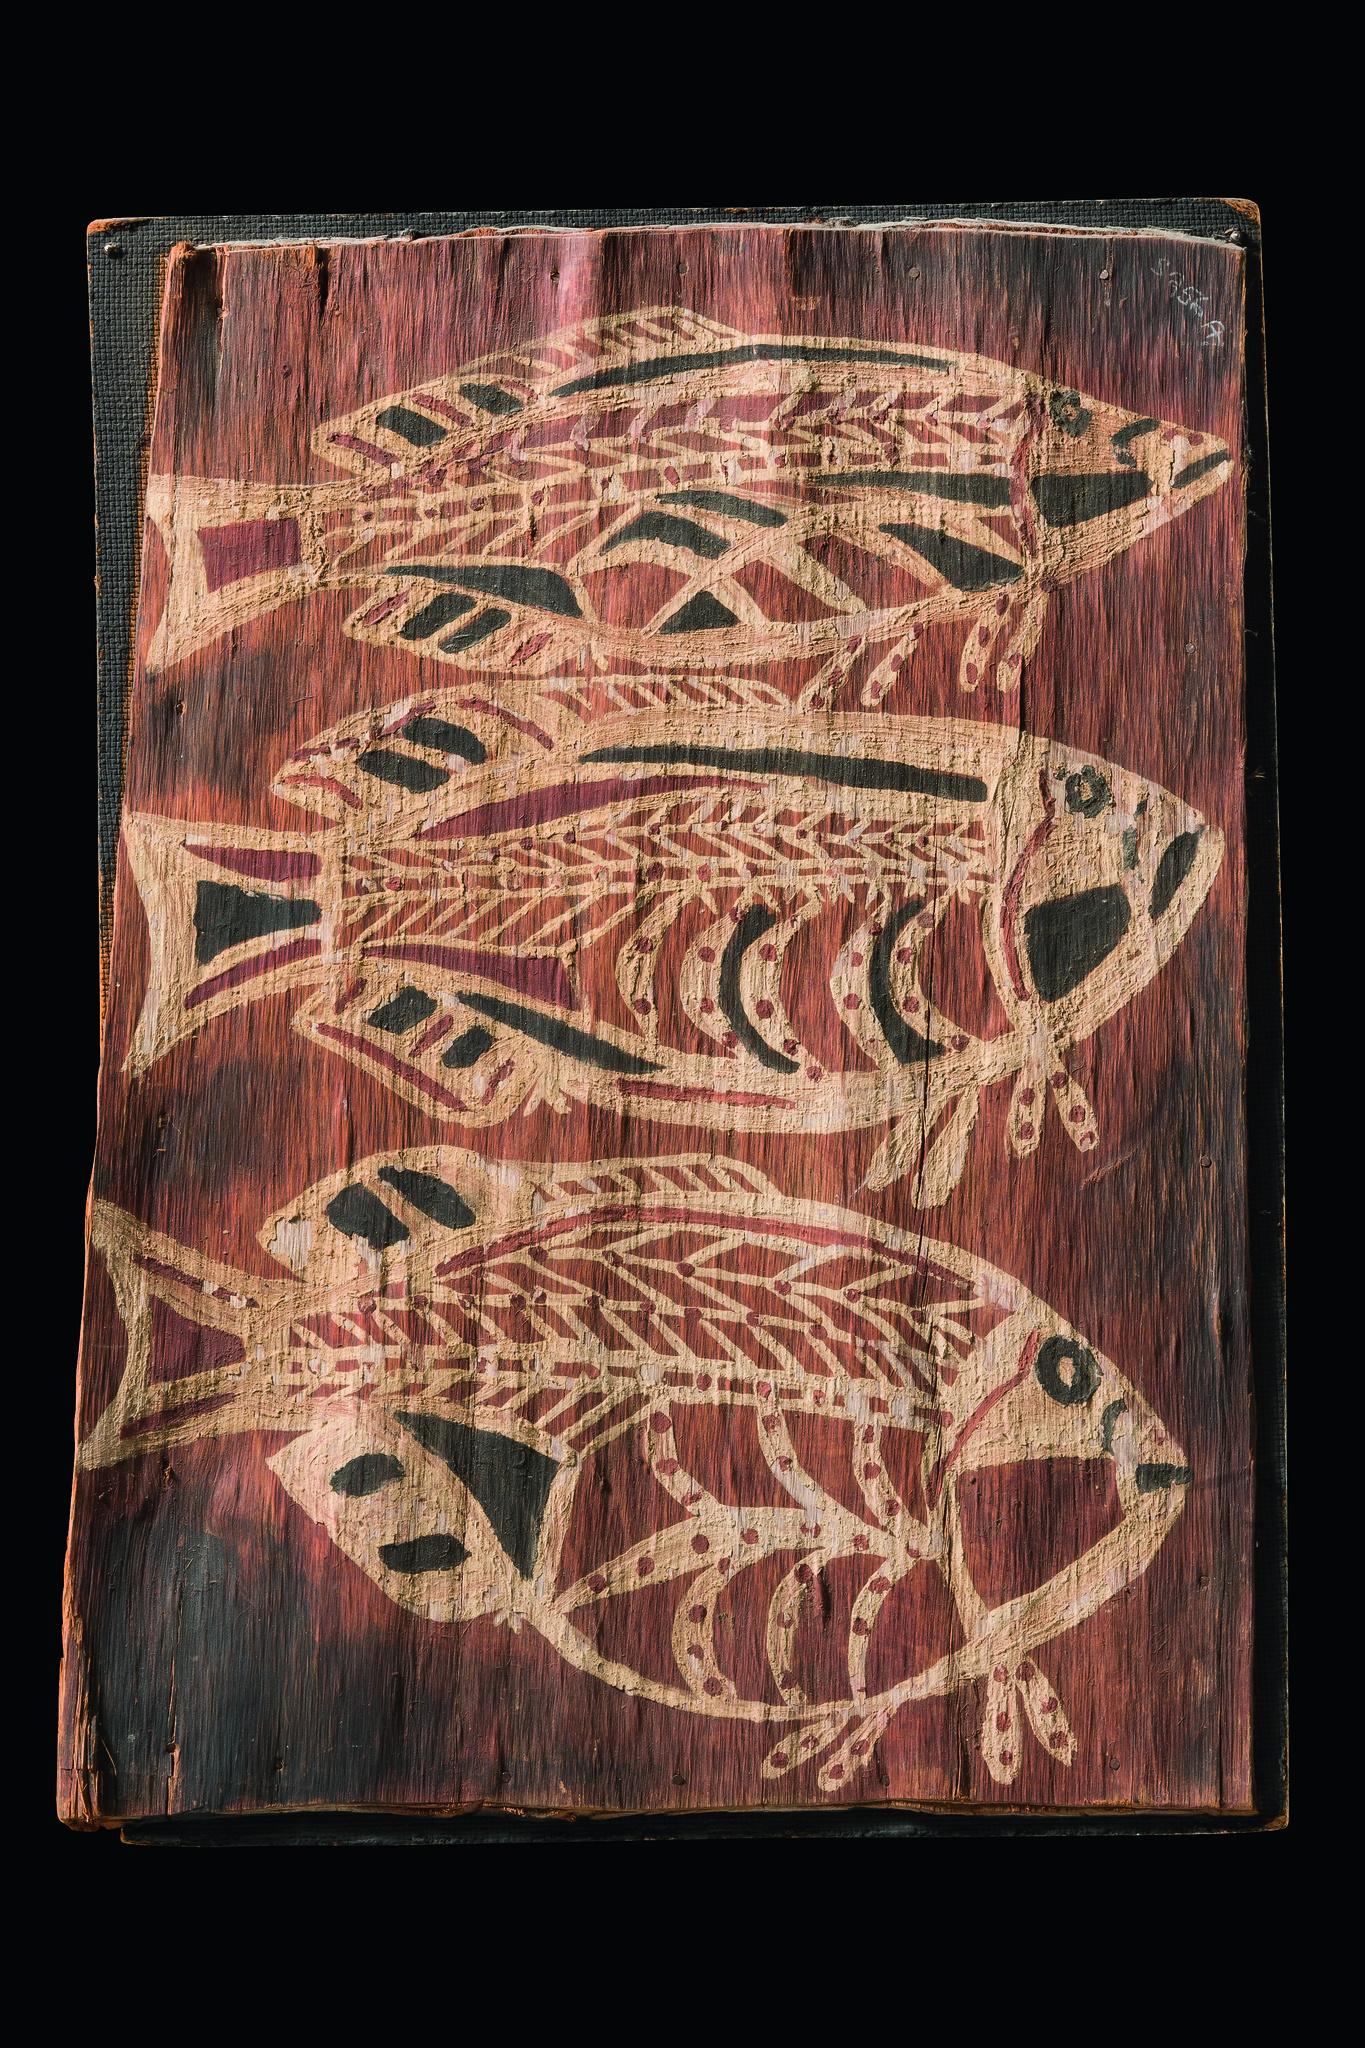 Barkpainting: Three fish